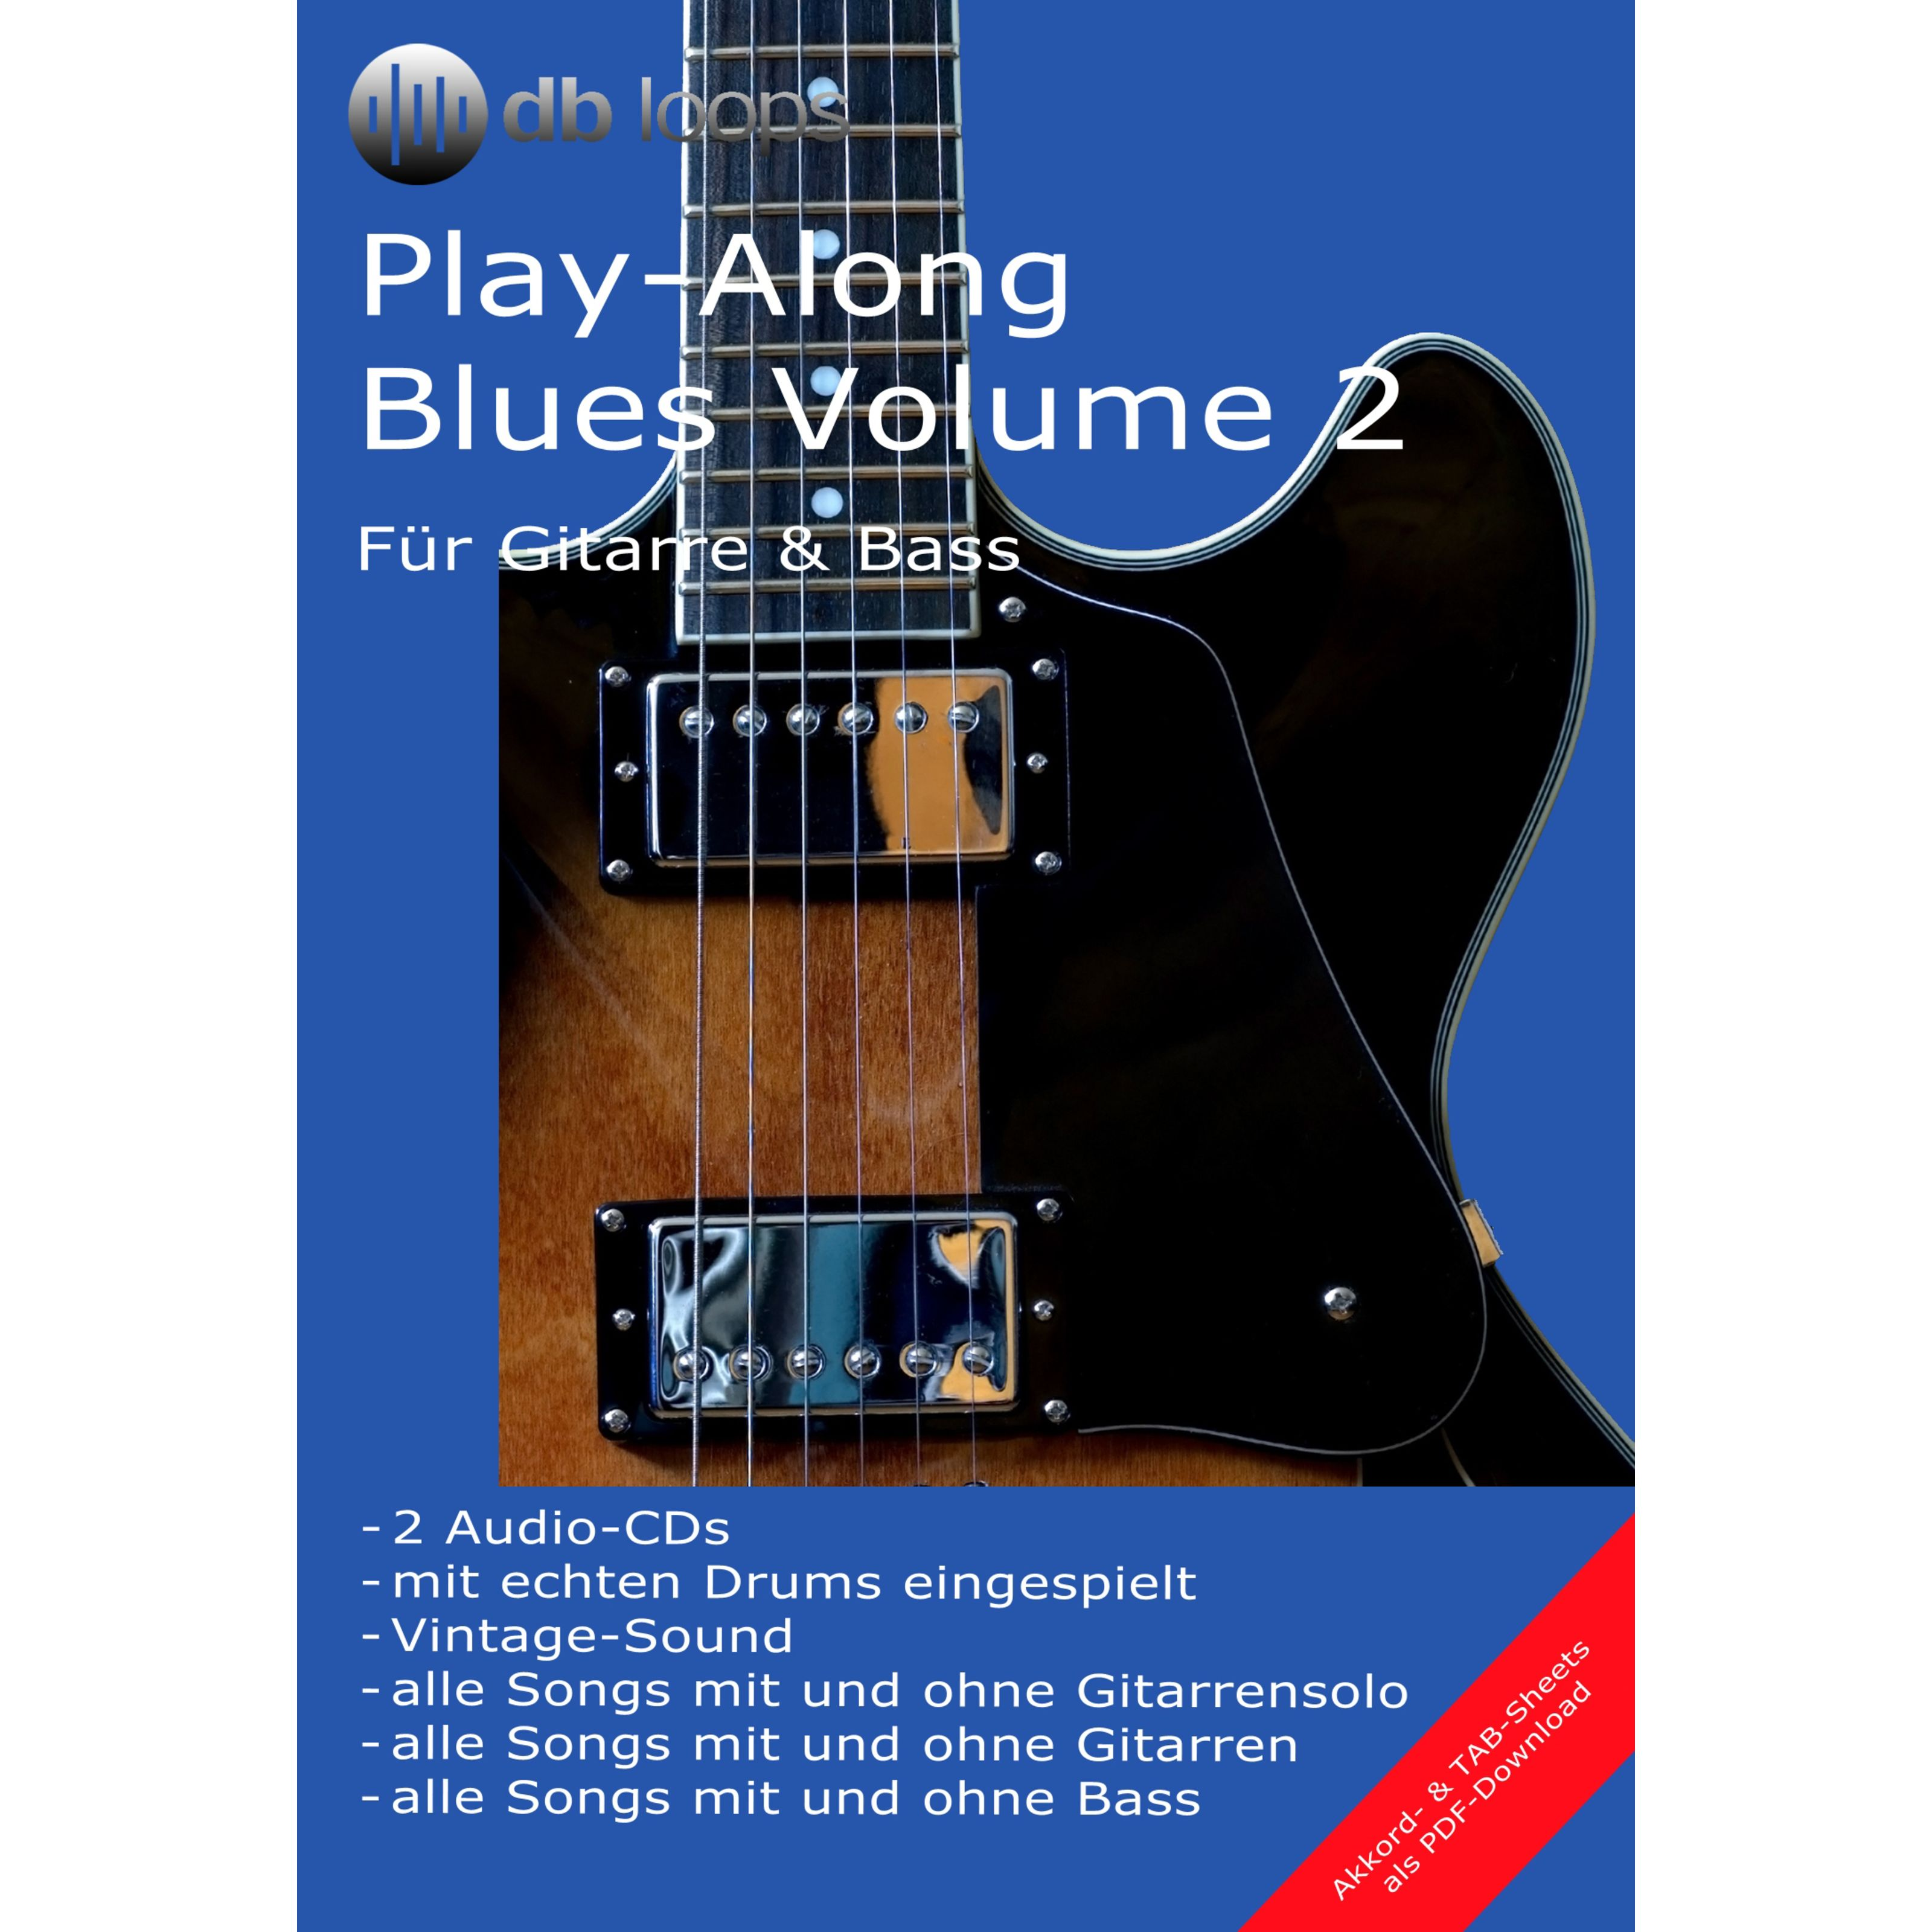 db loops - Blues - Volume 2 Gitarre Playalong 1-002